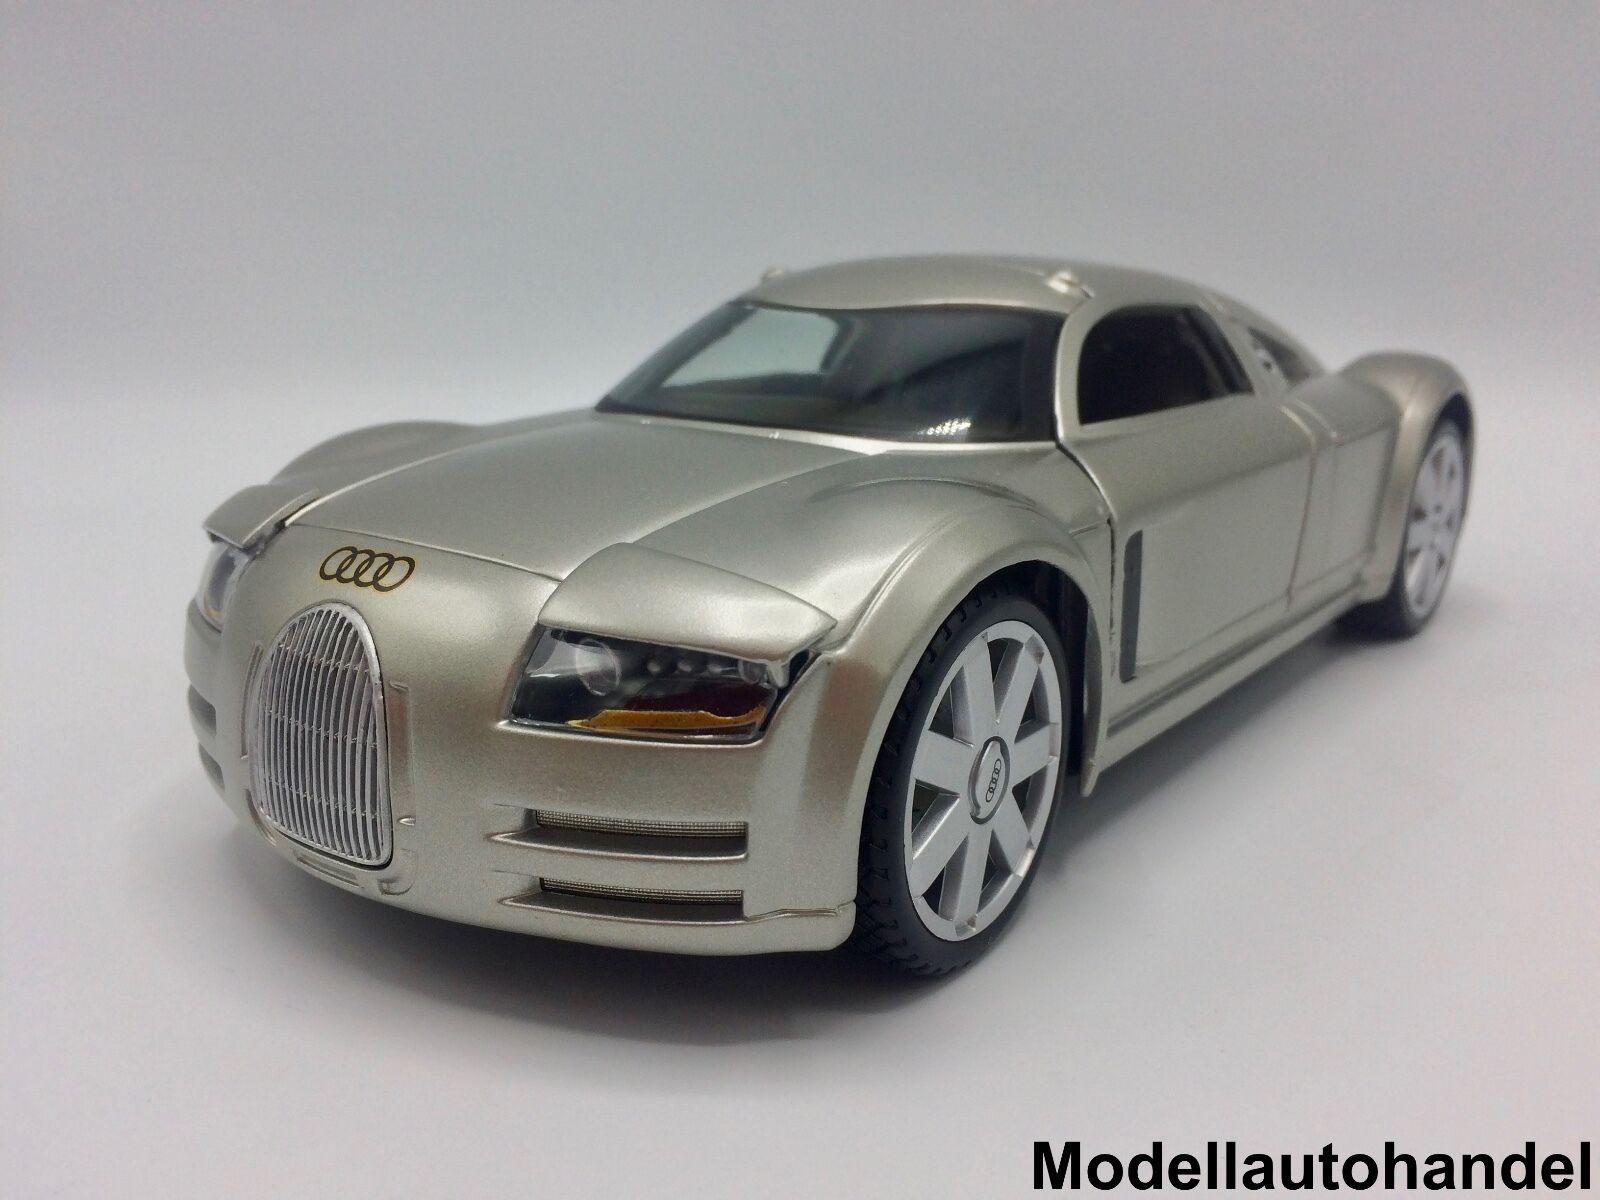 Audi Super Sport ROSEMEYER-Argent - 1 18 Maisto-Prix Recommandé